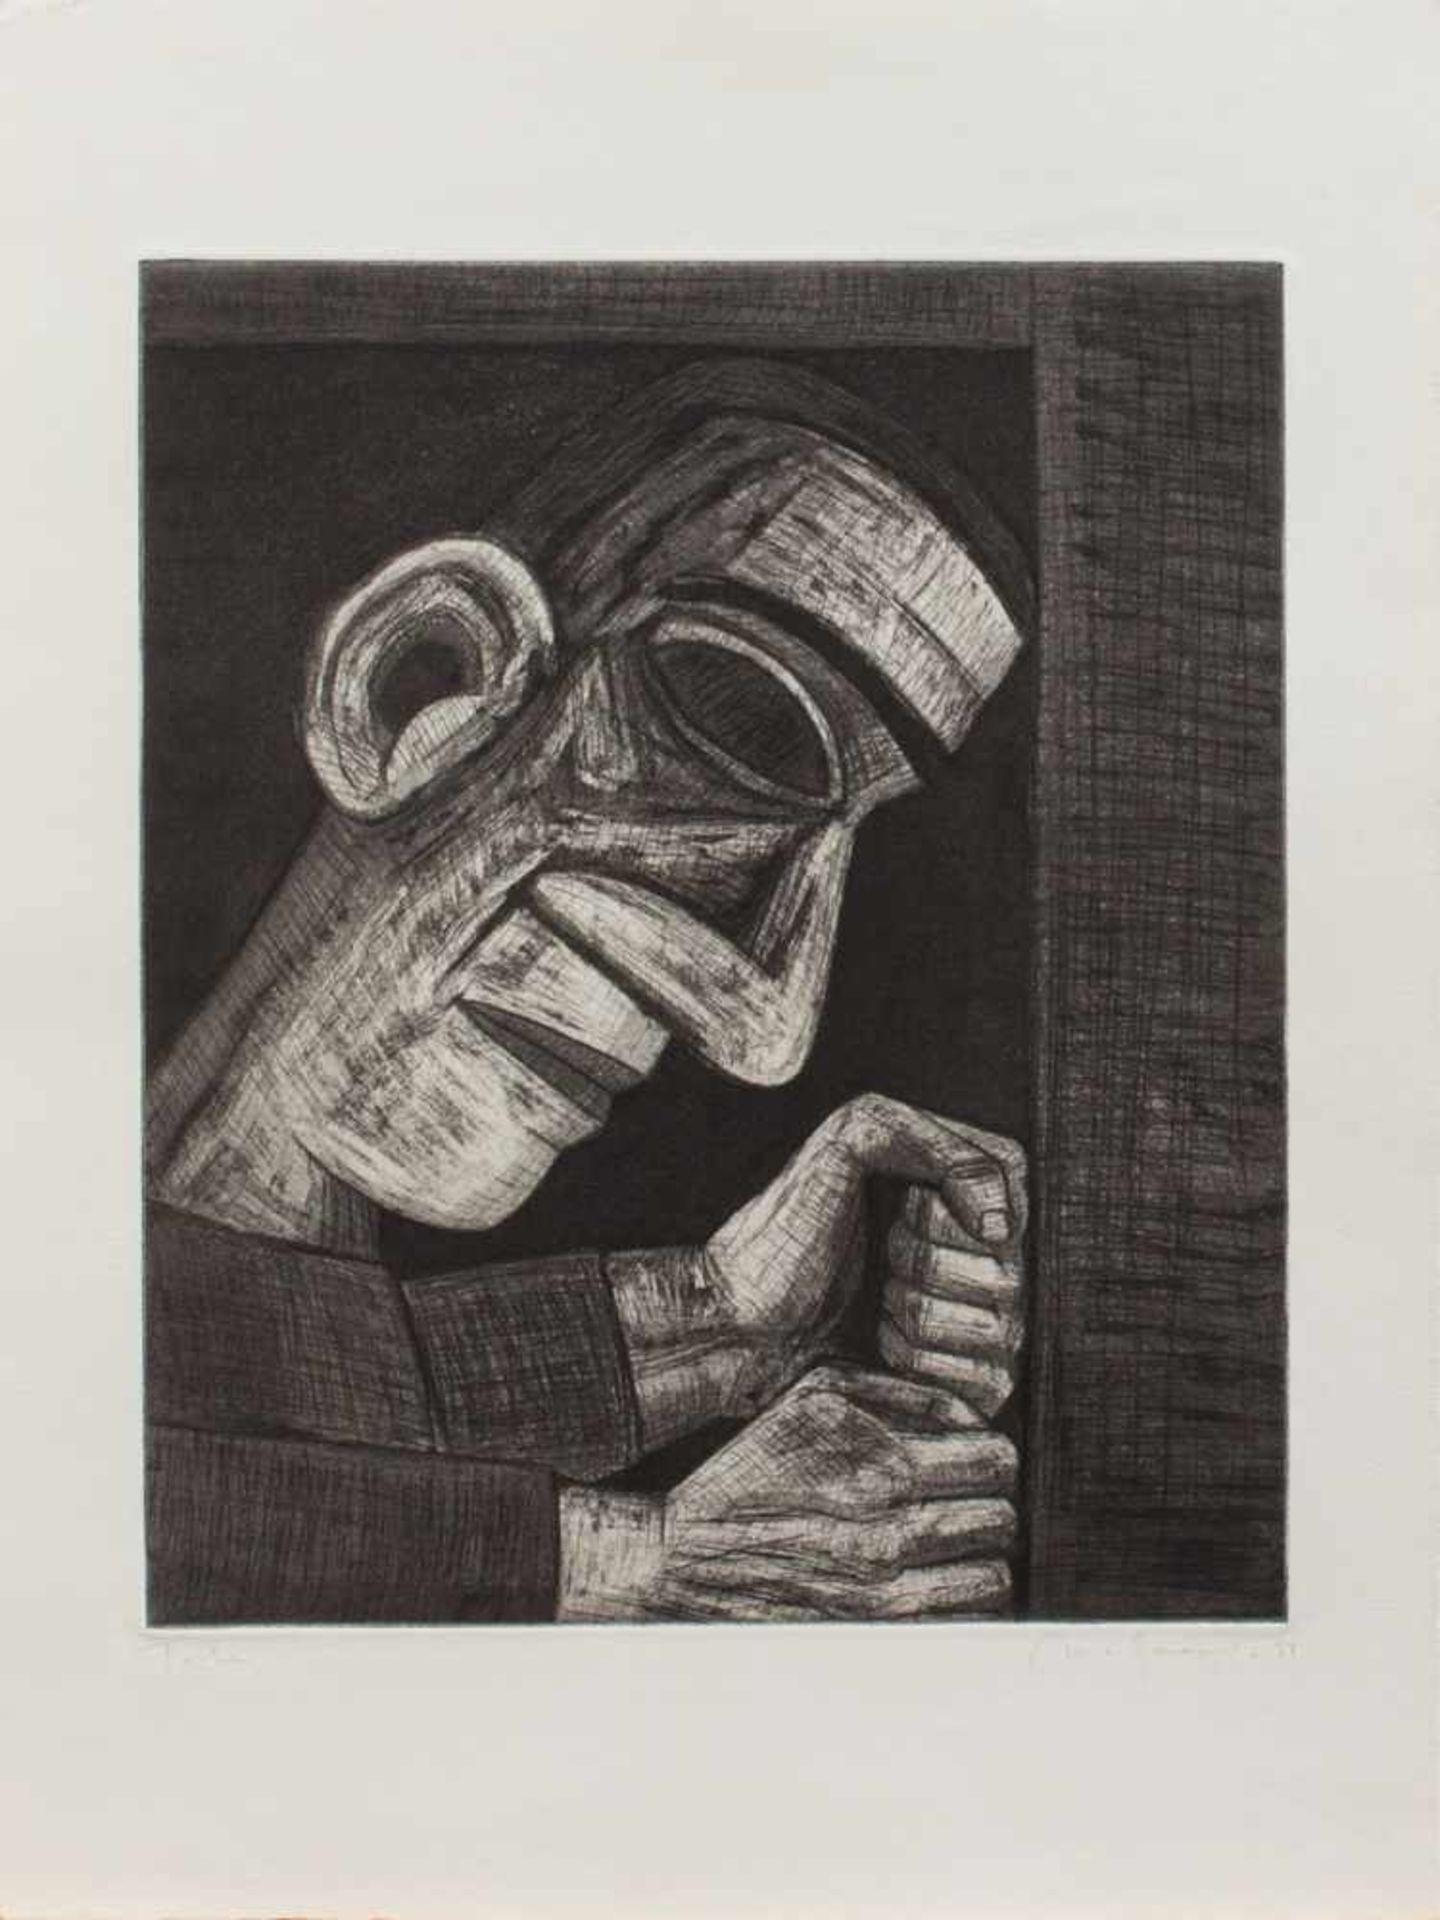 Nuria Quevedo(Barcelona 1938 -, Malerin u. Grafikerin spanischer Abstammung, Std. a.d. HS f.